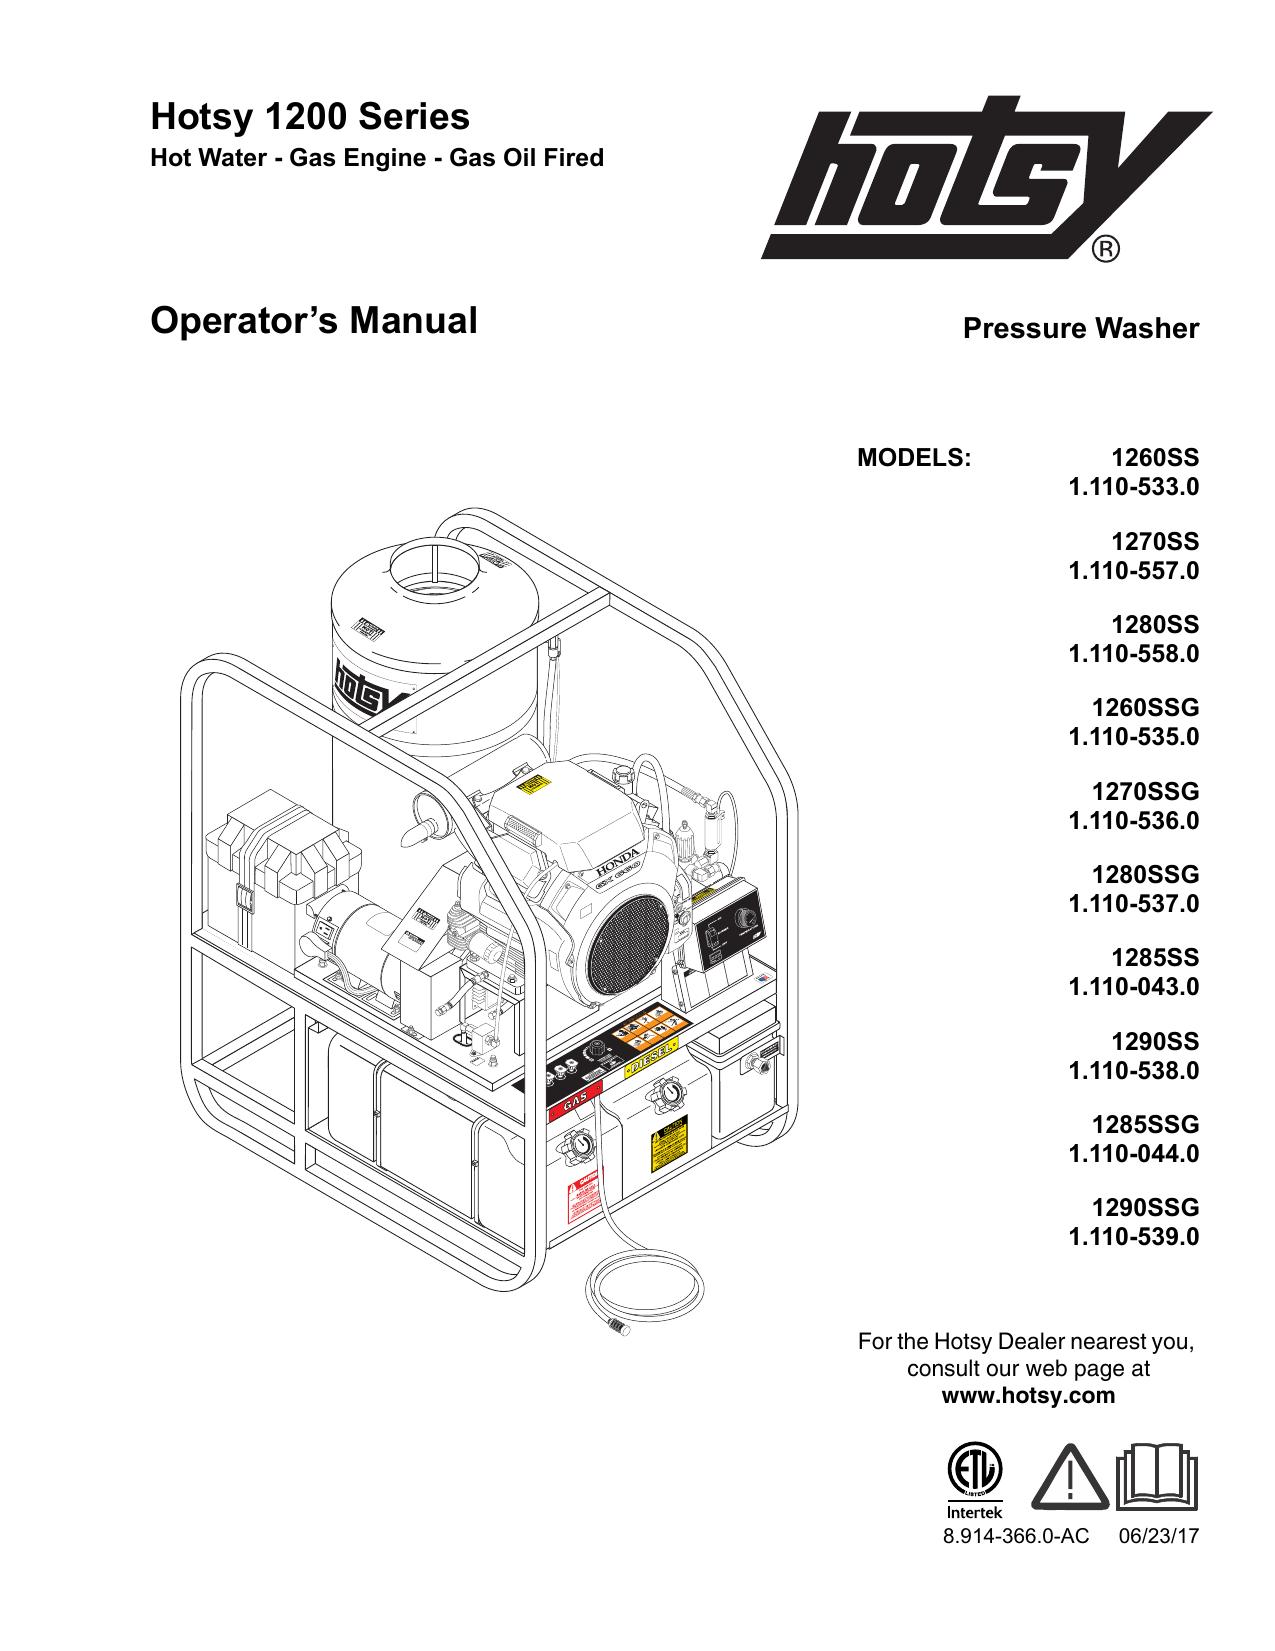 Hotsy Wiring Diagram